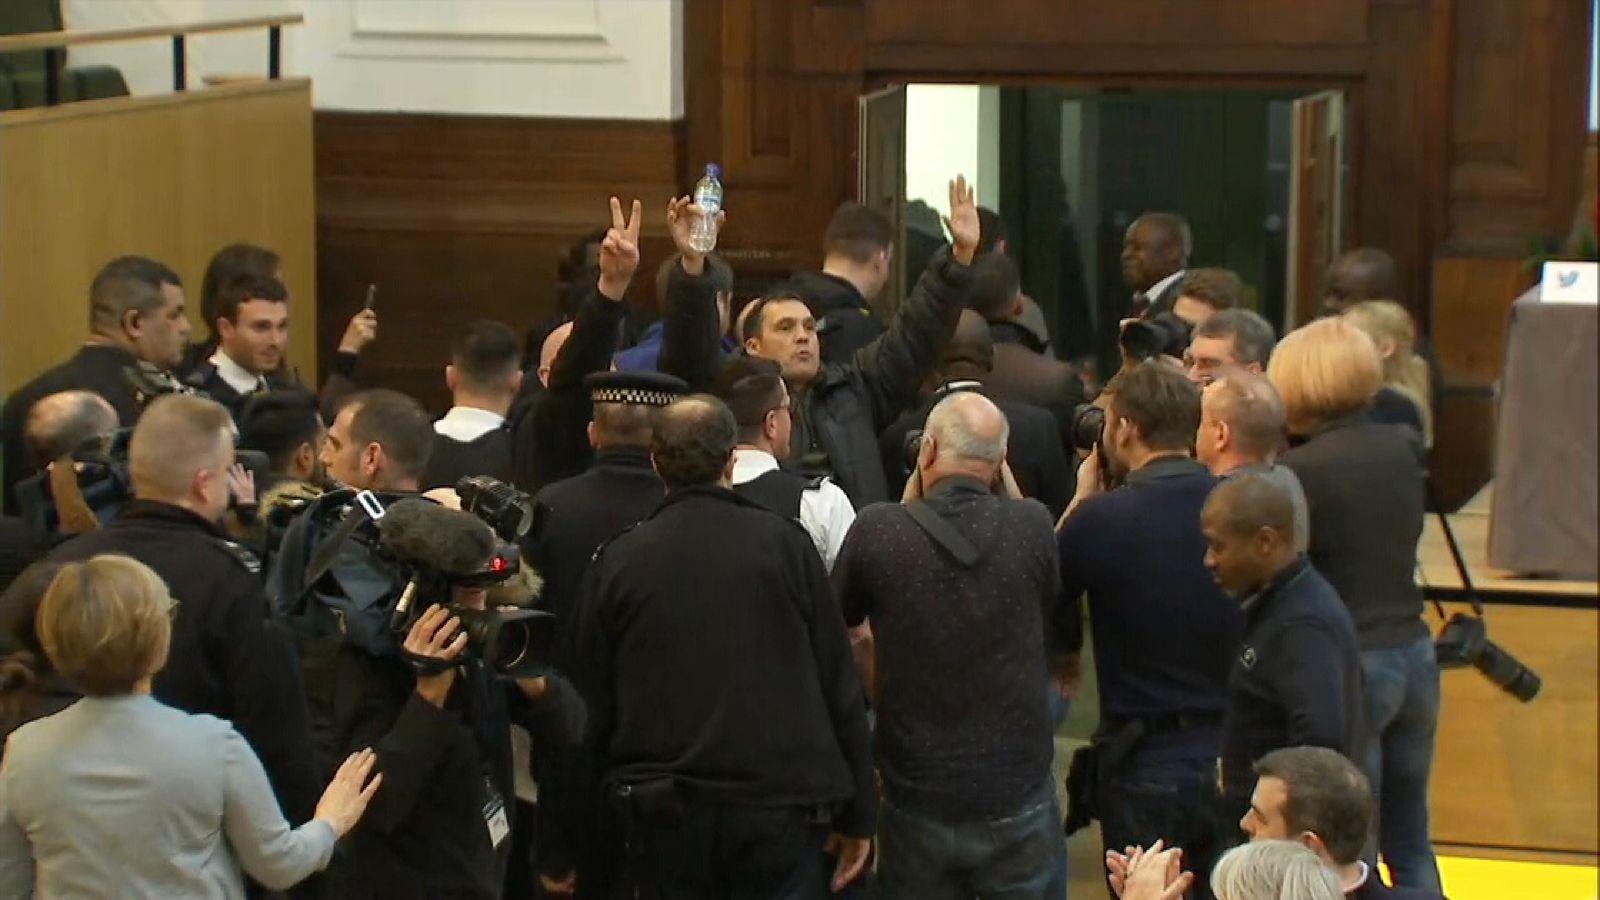 Trump supporters demand London Mayor Sadiq Khan arrest